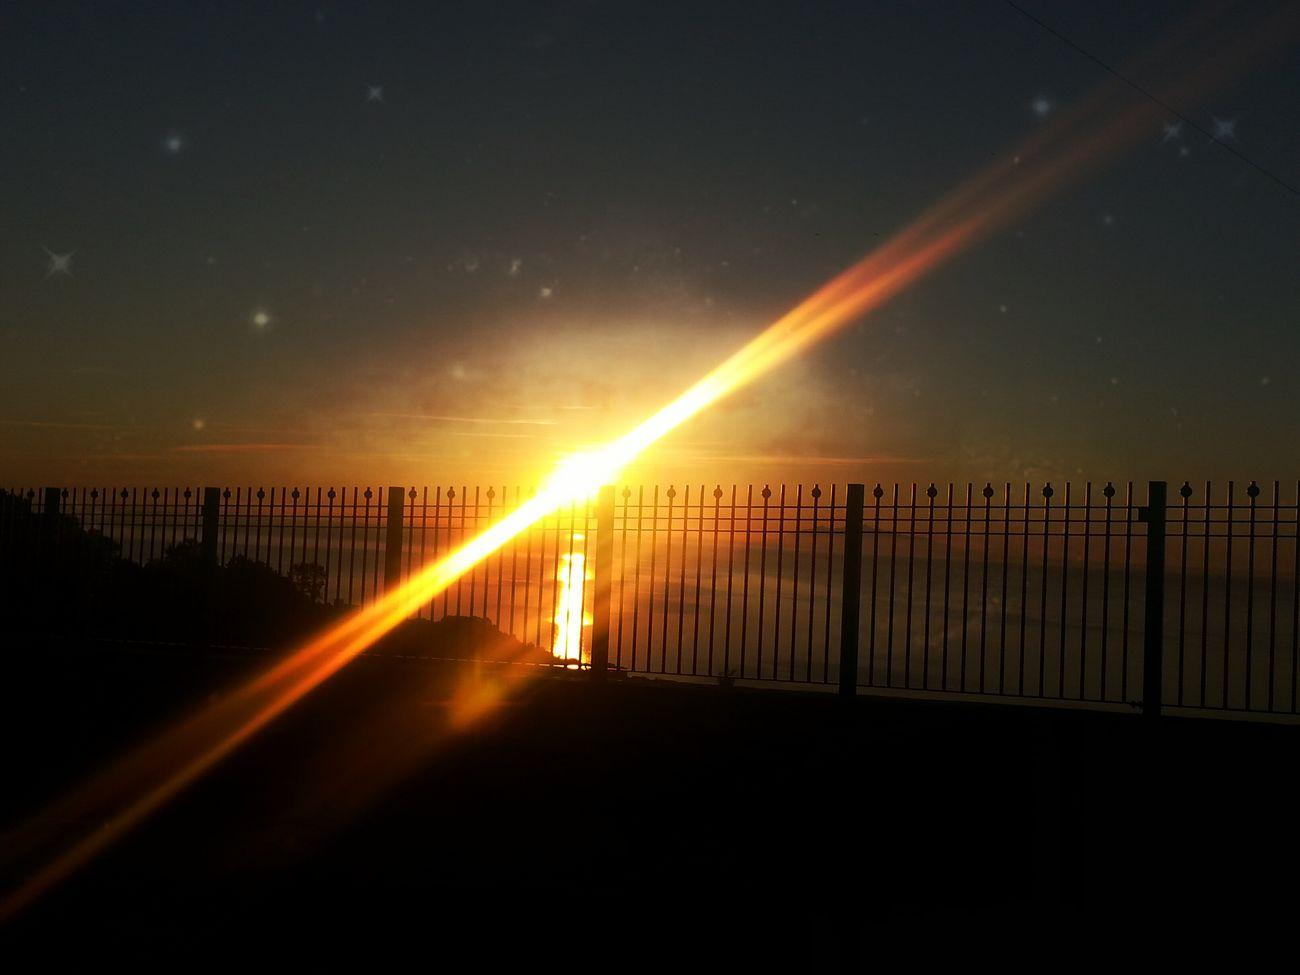 Le jour se lève. ... Enjoying The Sun Sky Sunset_collection Sun_collectionSun_collection